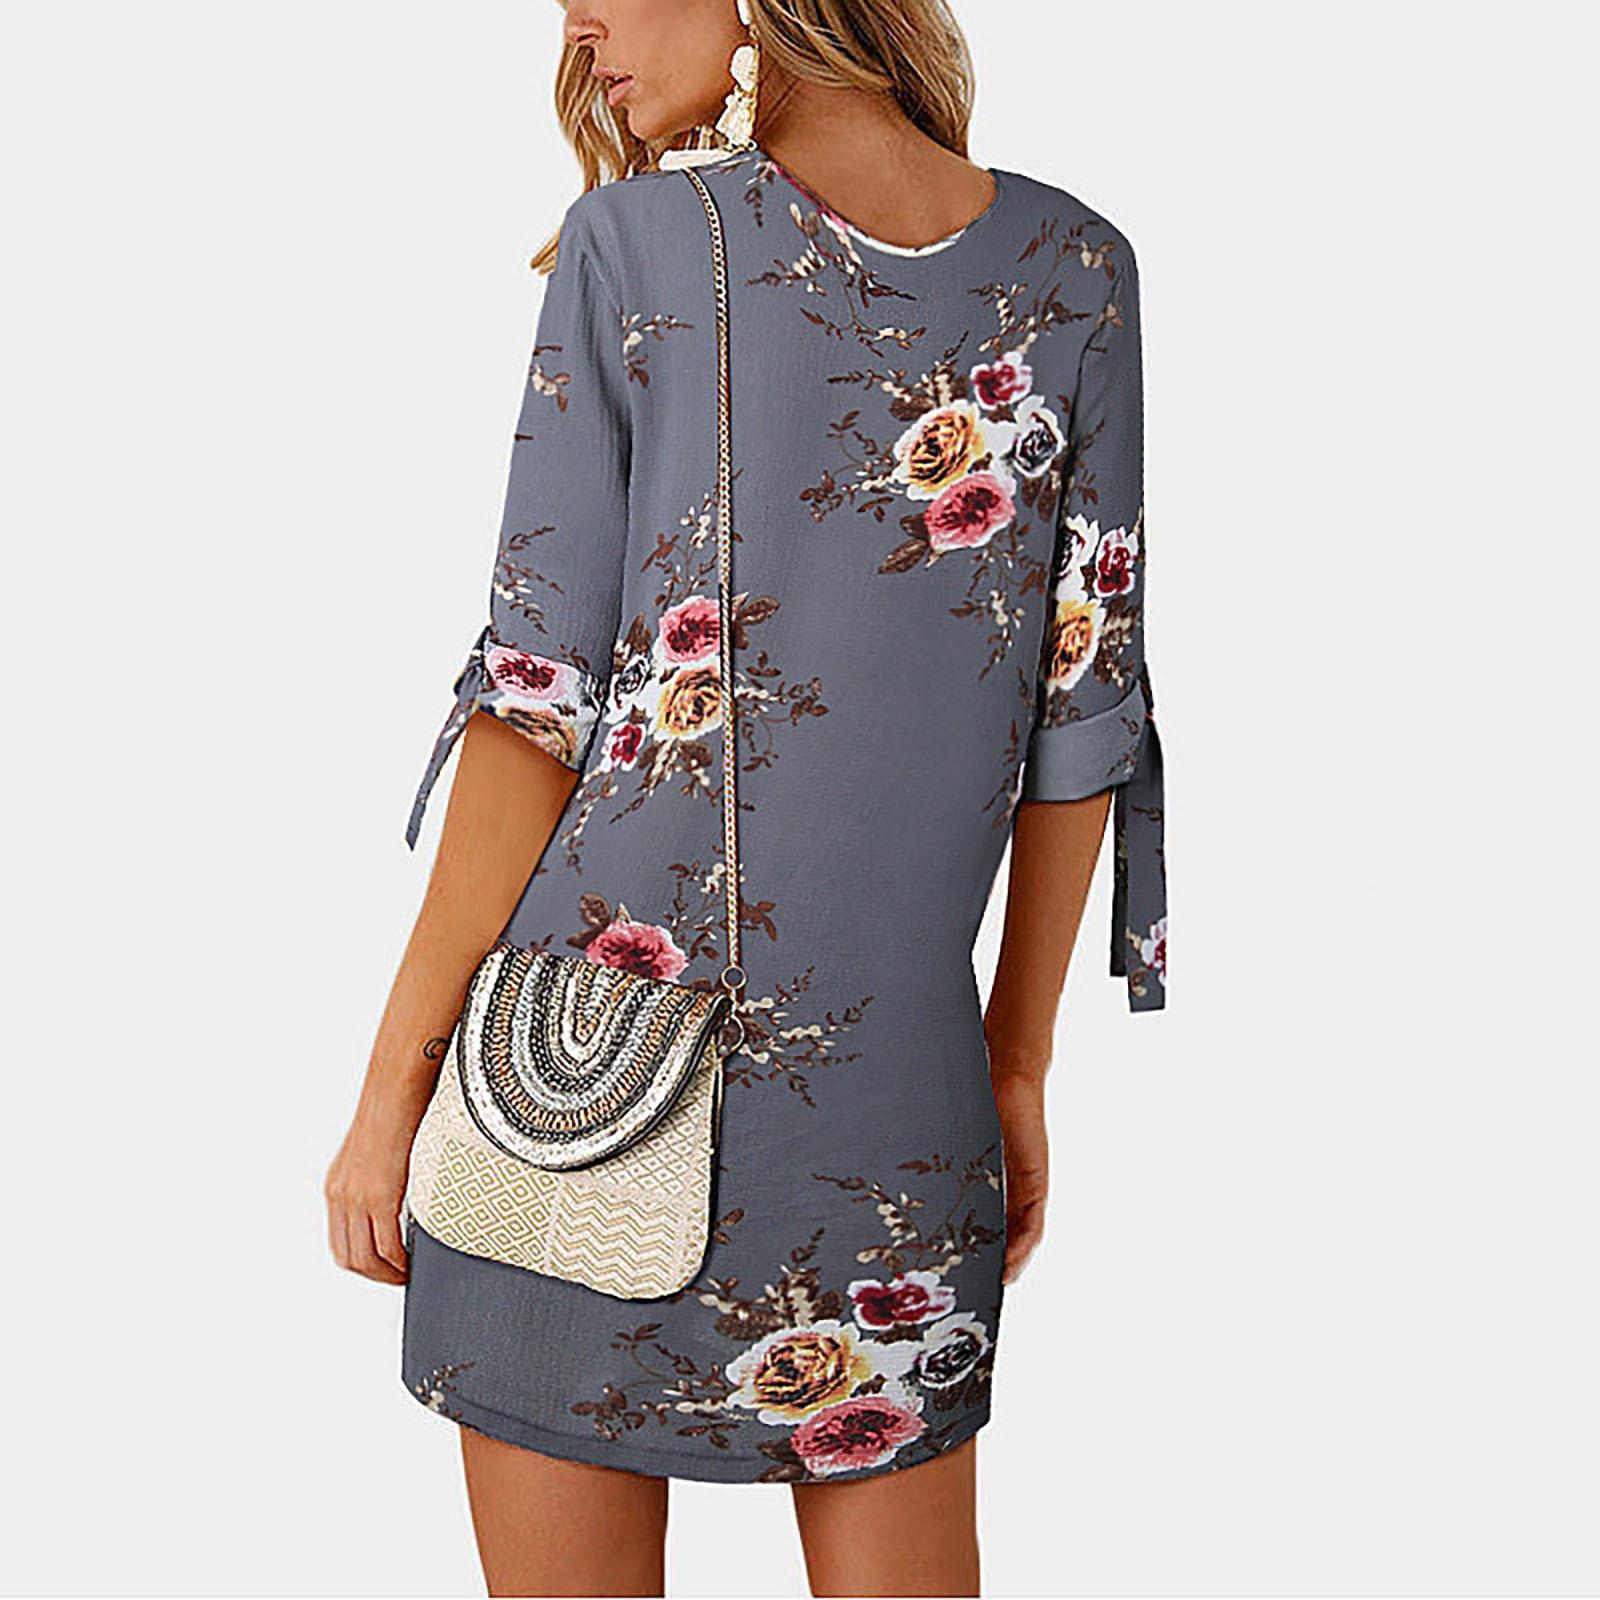 Women's casual fashion chiffon print round neck tie three-quarter sleeve dress vestido de mujer платье 2021 женское платье женское платье dolce